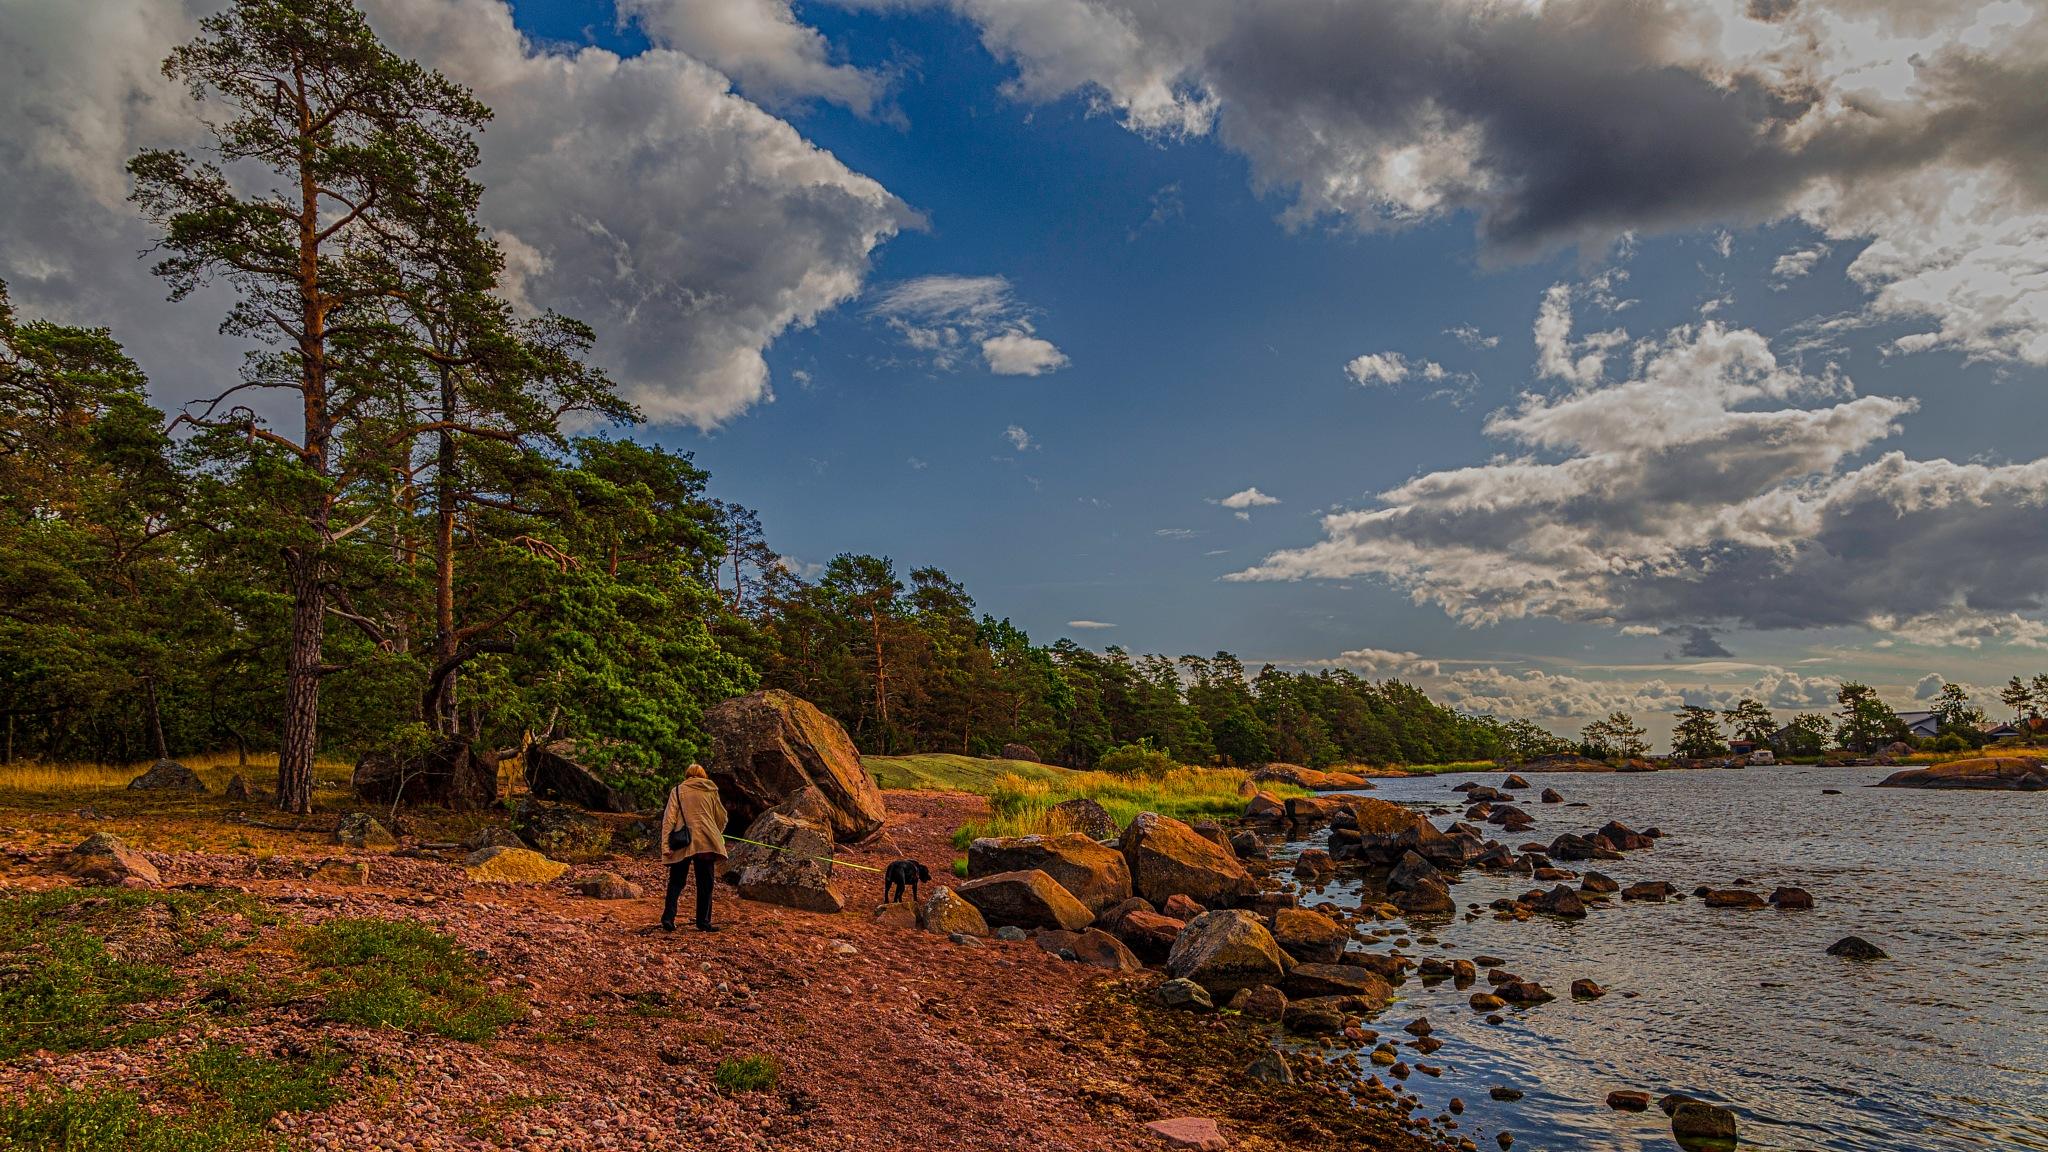 Autumn Walkie at the Swedish East-Coast by carljan w carlsson